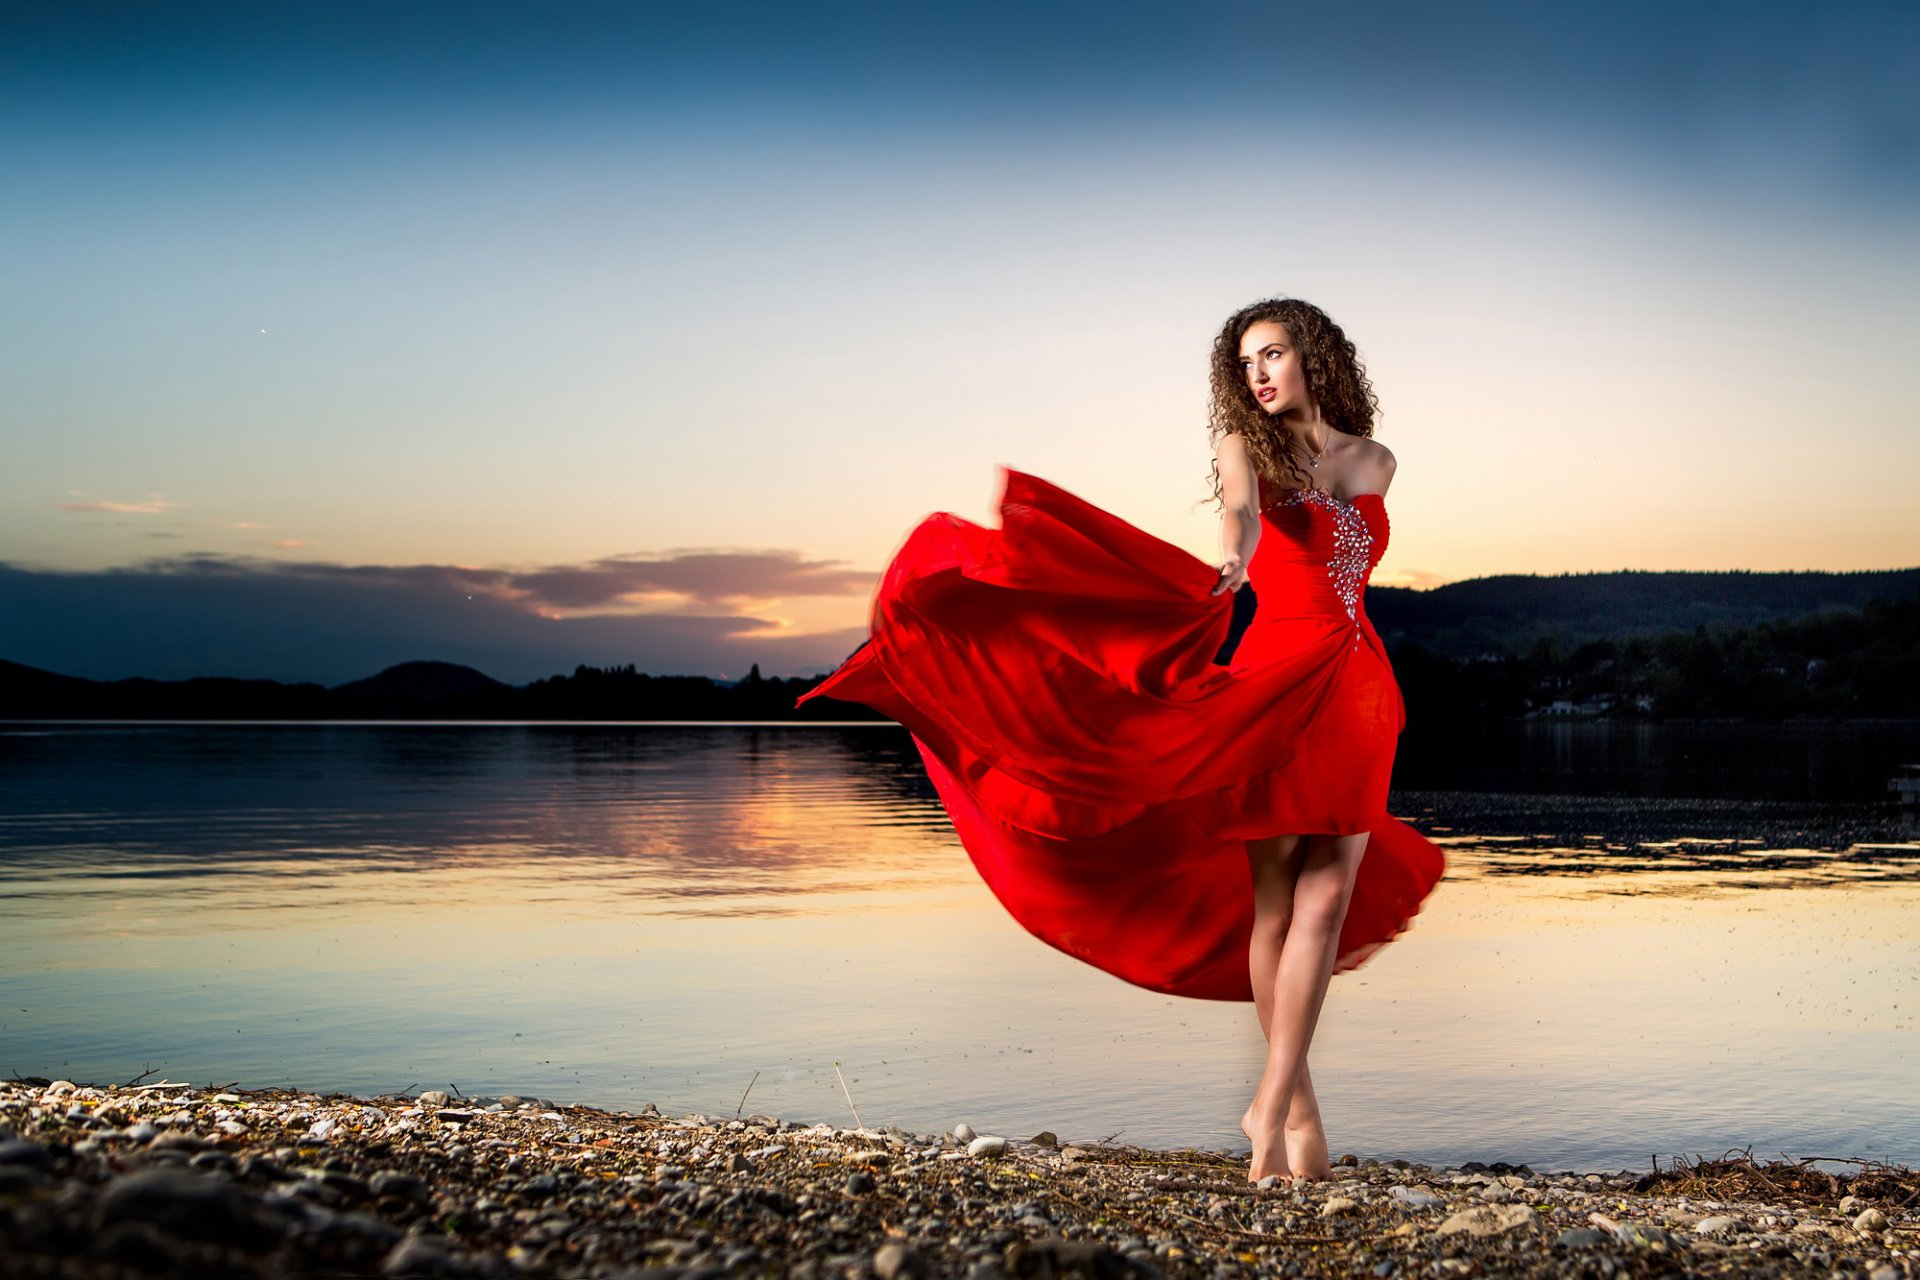 https://w-dog.ru/wallpapers/4/2/502928700794300/sunset-dance-devushka-v-krasnom-plate-bereg-tanec.jpg